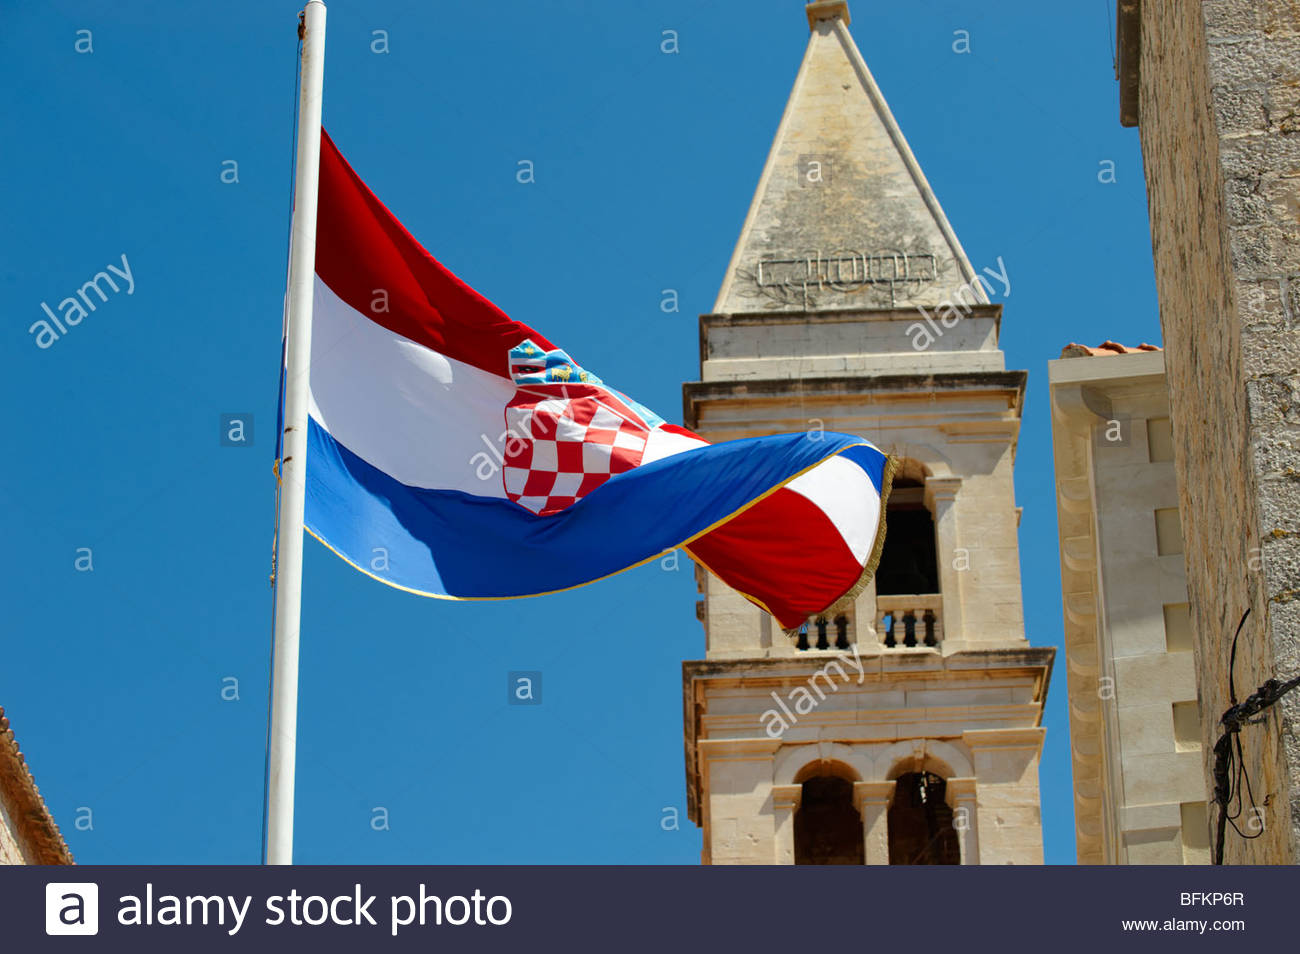 Croatian national flag, Supetar harbour, Brač island, Croatia - Stock Image